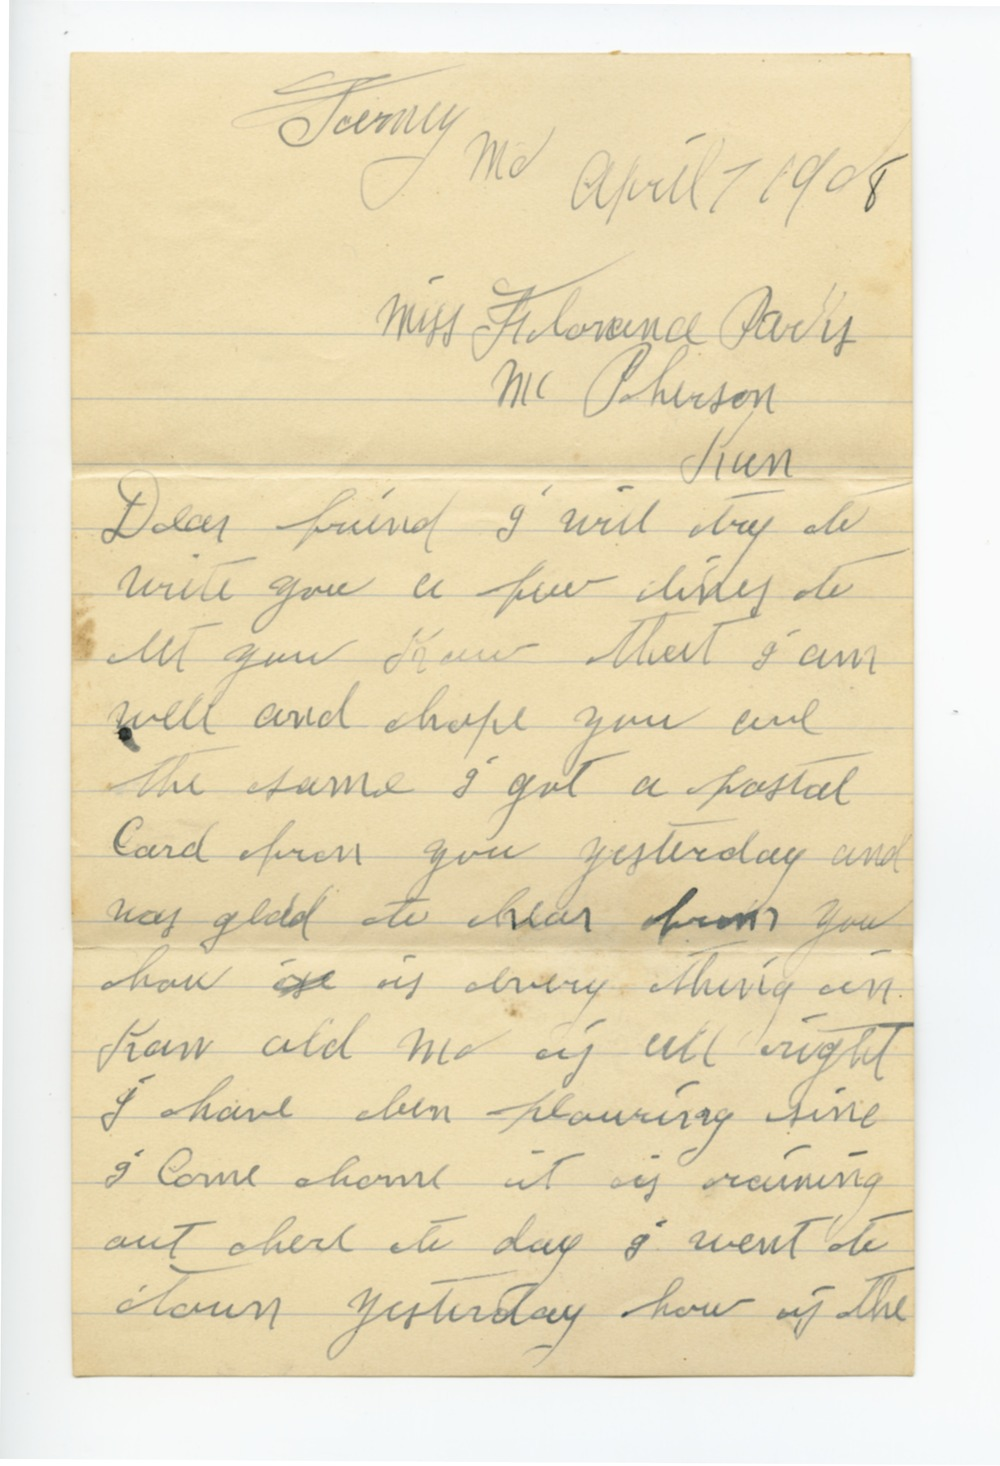 Arthur Edward Mattox and Hulda Florence Parks Mattox collection - 1